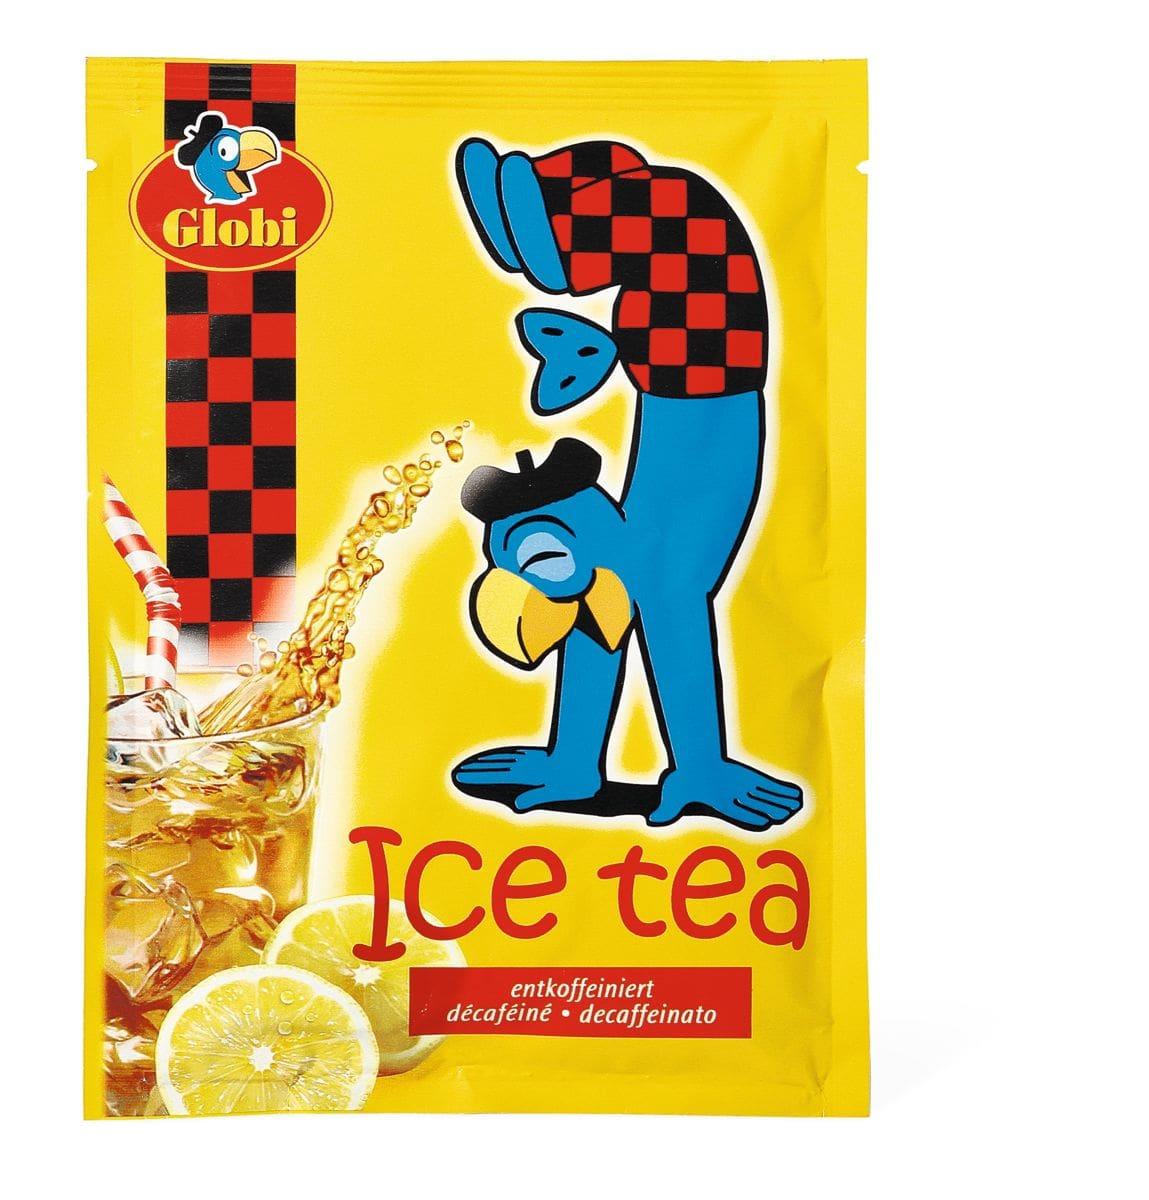 Globi Ice Tea